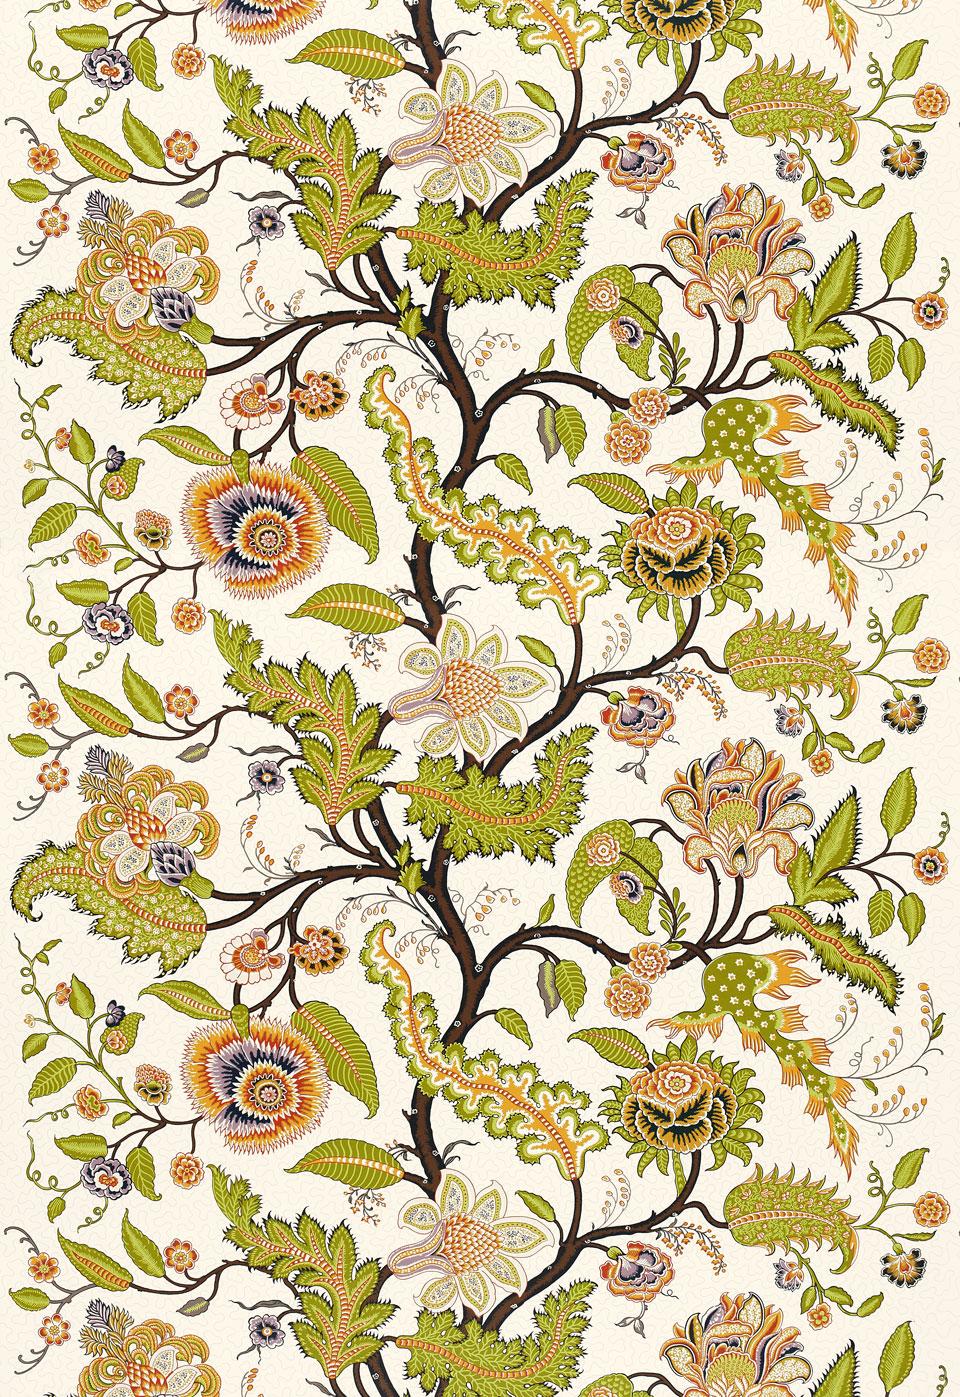 Wallpaper Trends 2015 Loretta J Willis DESIGNER 960x1397